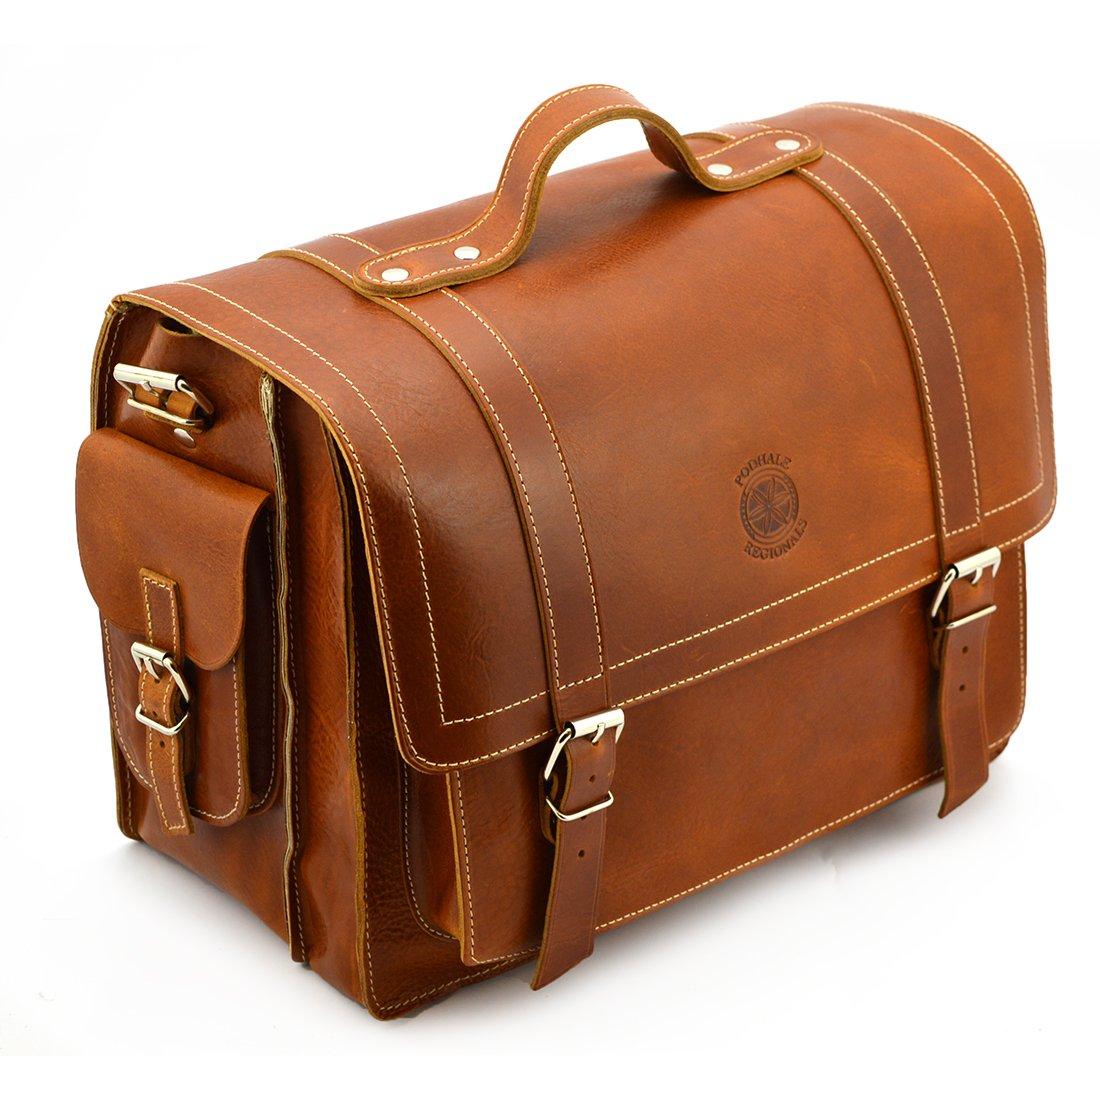 3494570c21b25 Klasyczna torba Podhale Regionals b918 koniak - Kup teraz Online